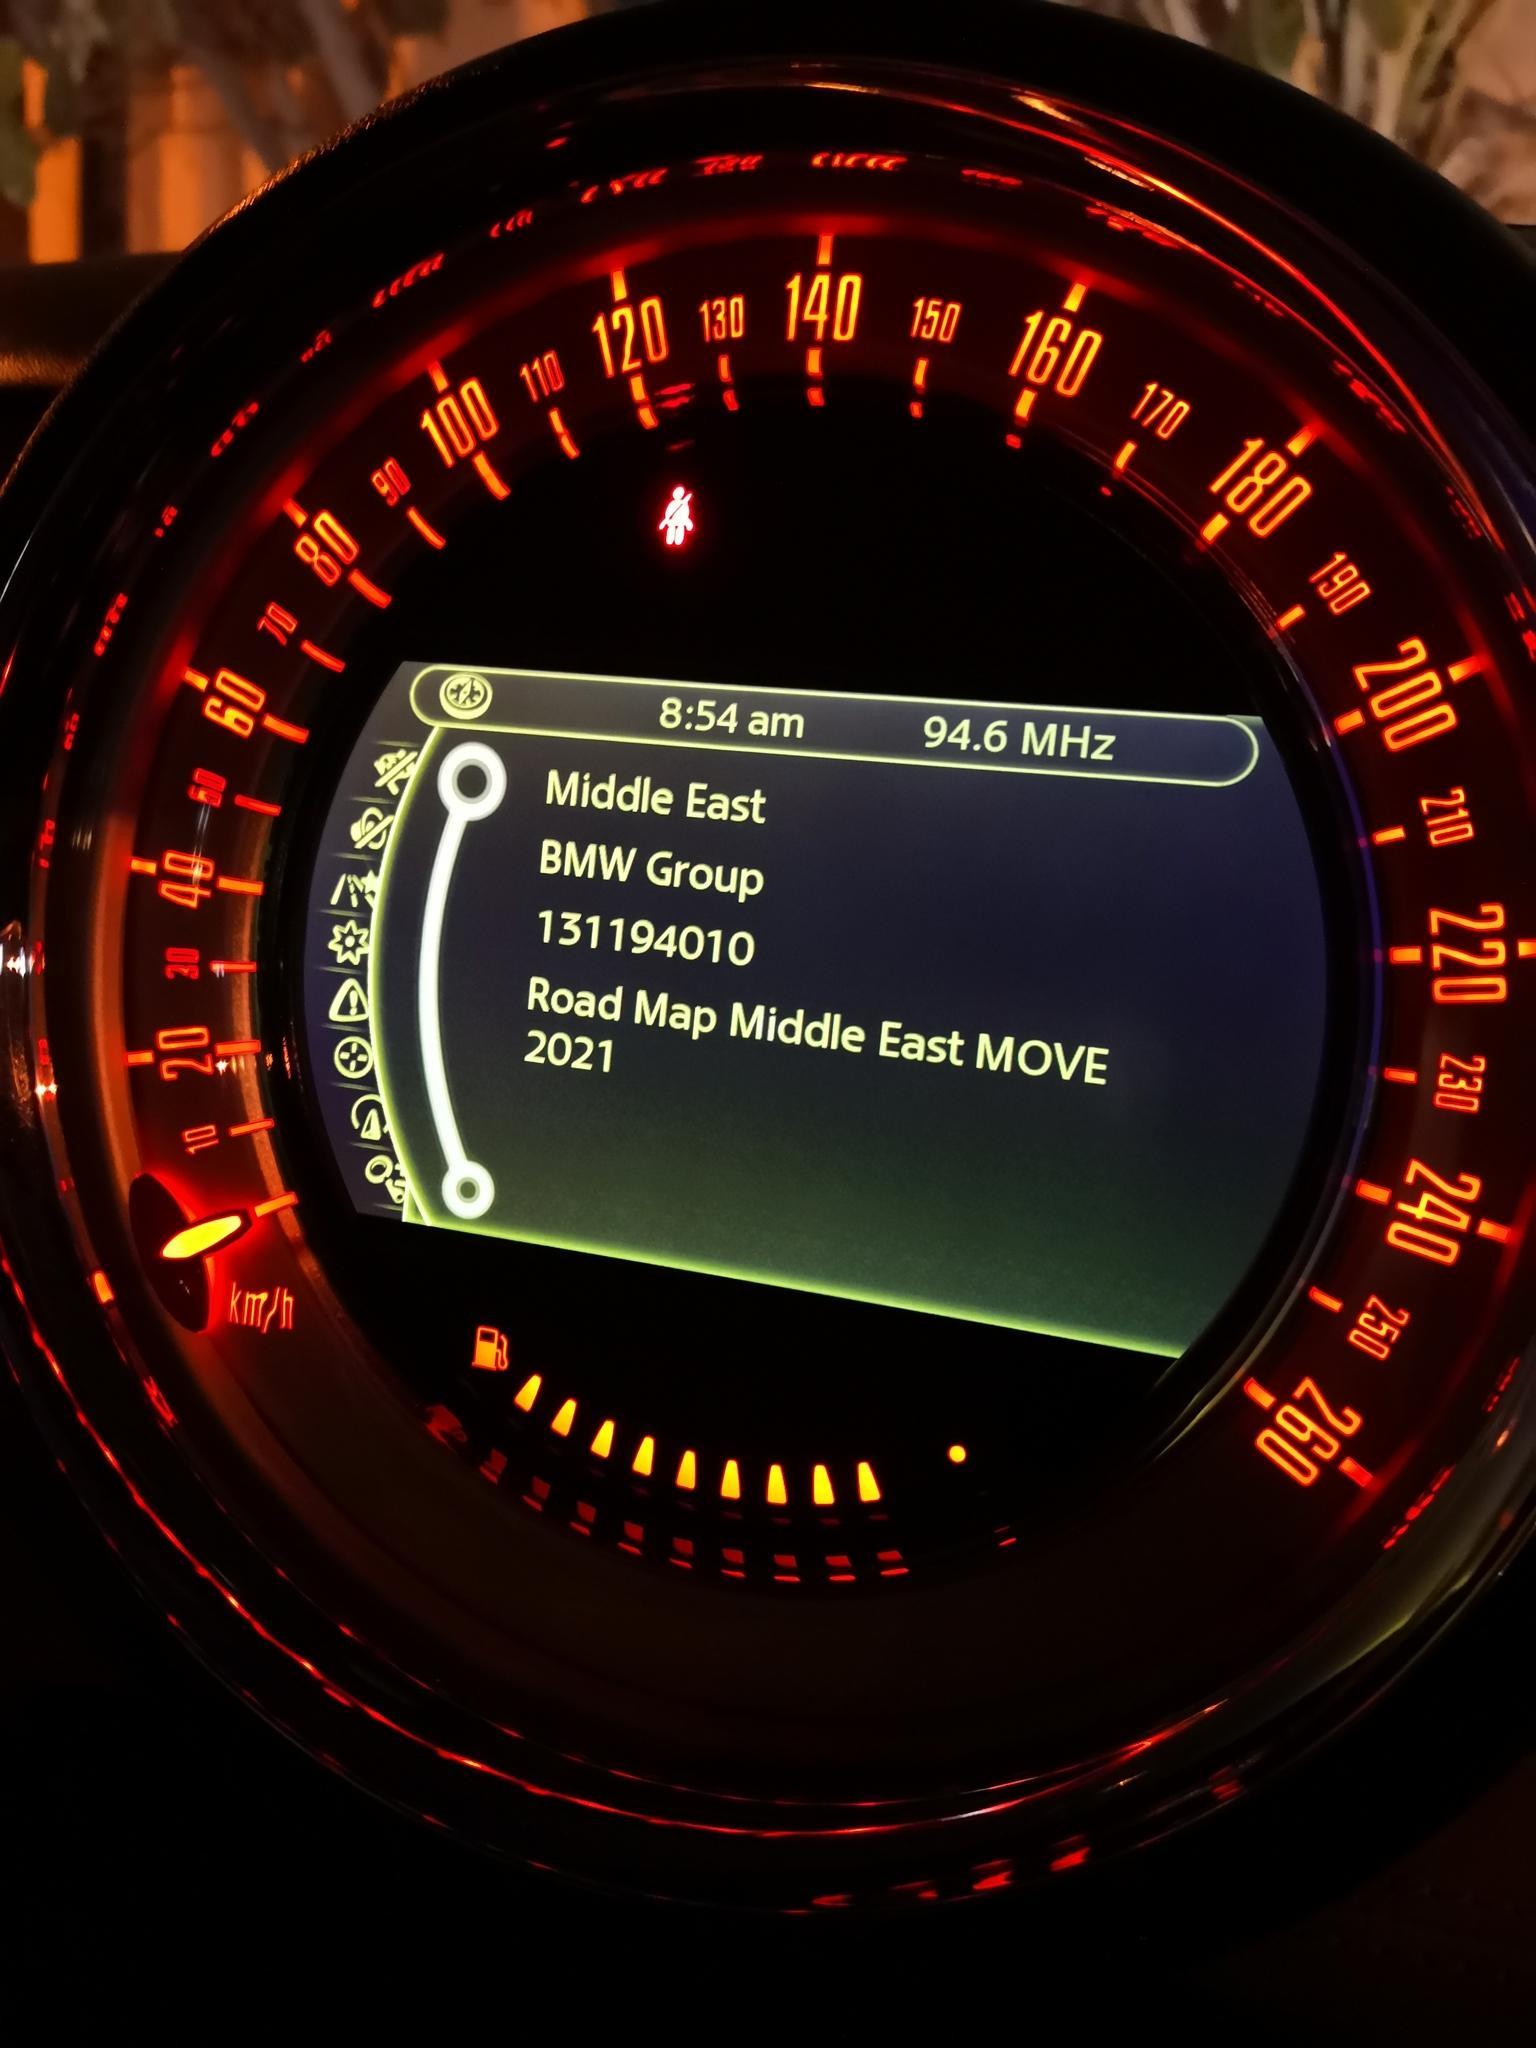 BMW MINI Diagnose; BMW Map navigation Update